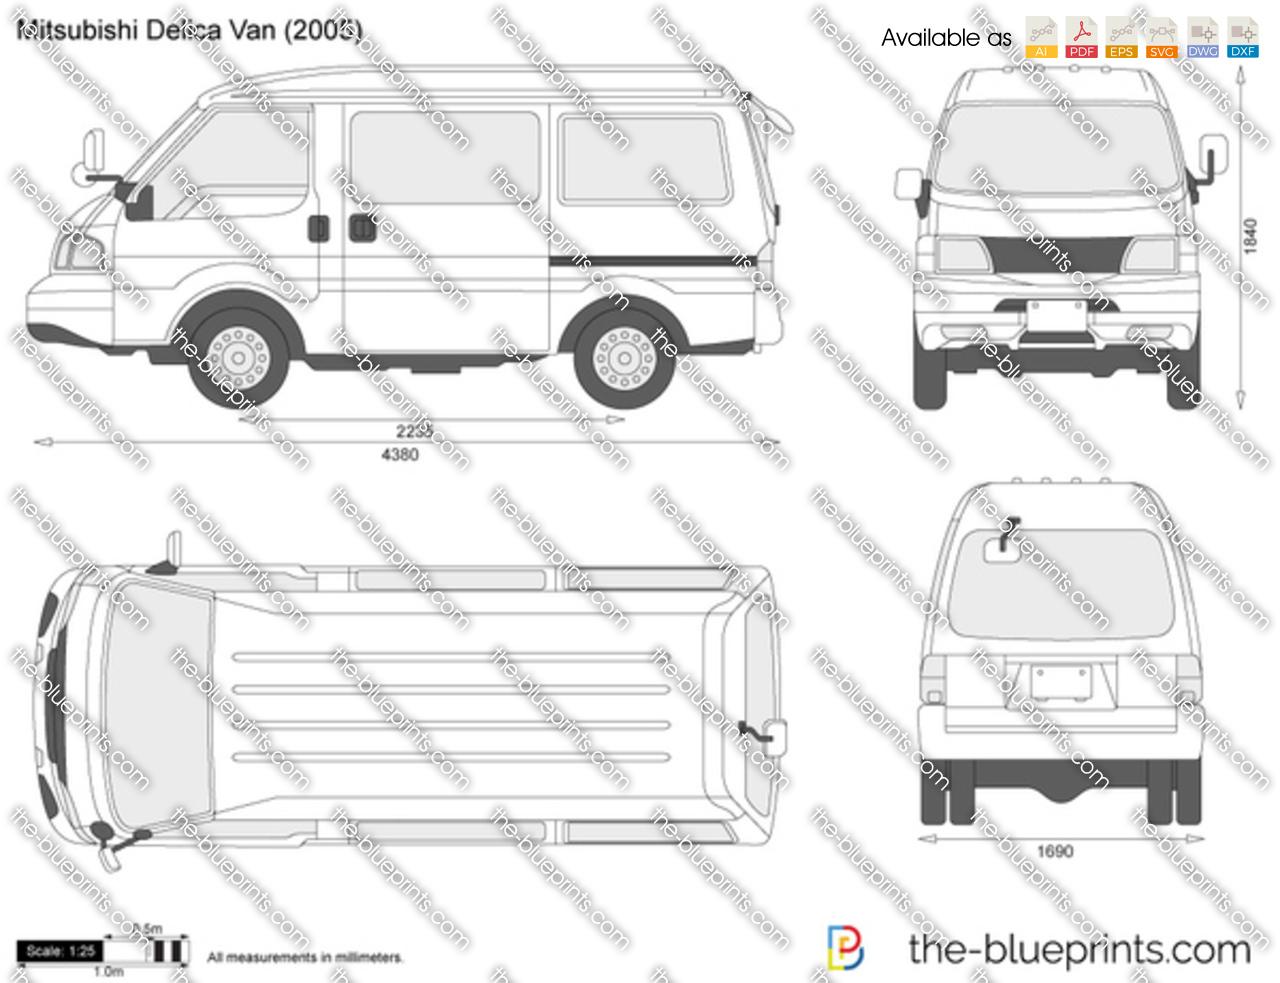 Mitsubishi Delica Van 1990